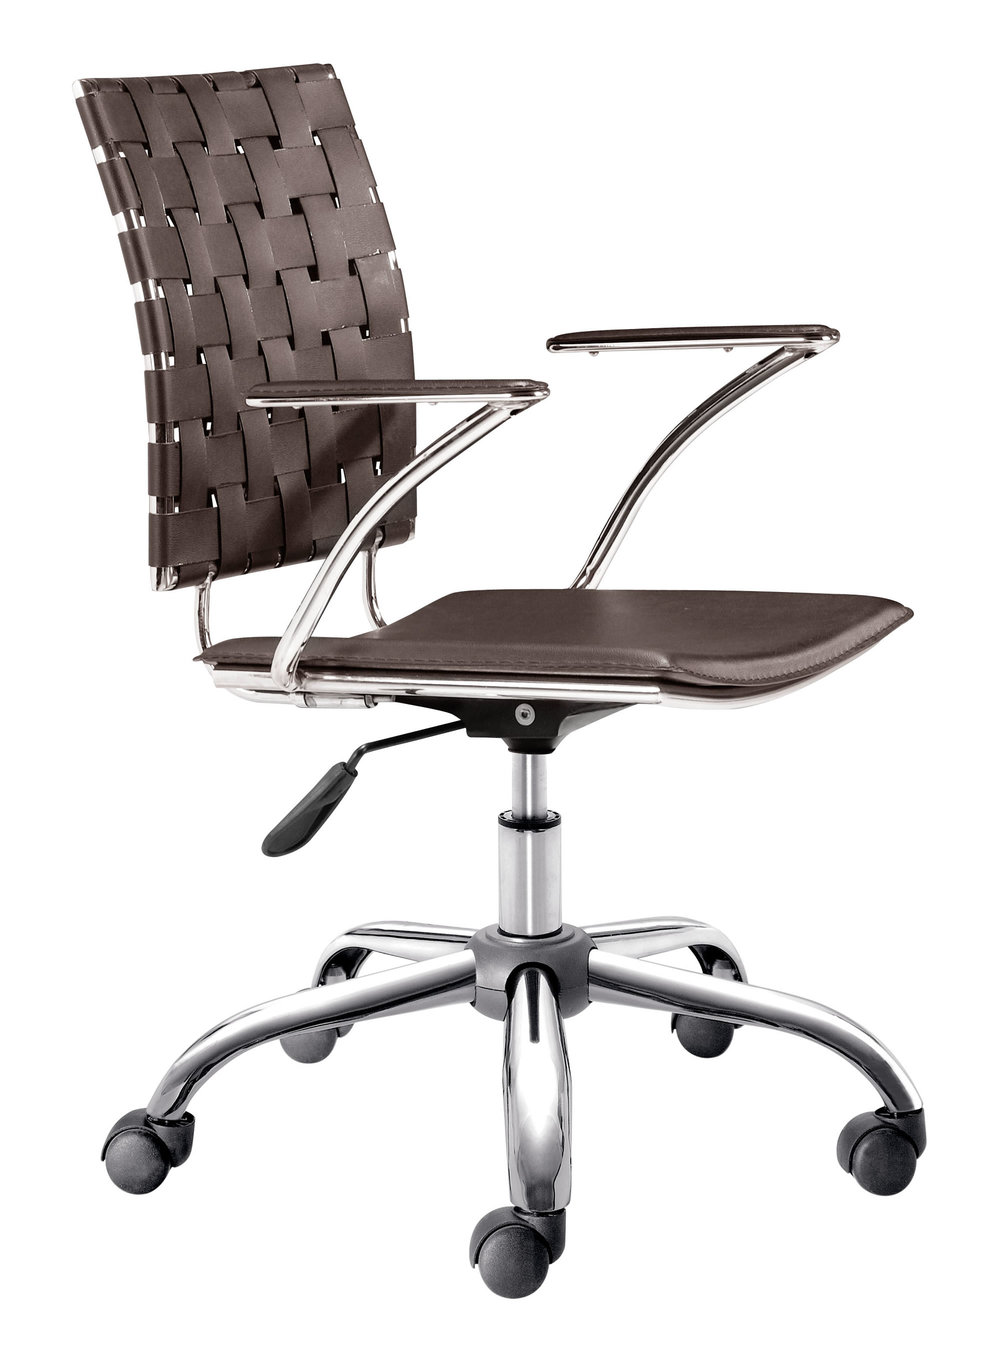 Zuo Modern Contemporary - Criss Cross Office Chair Espresso